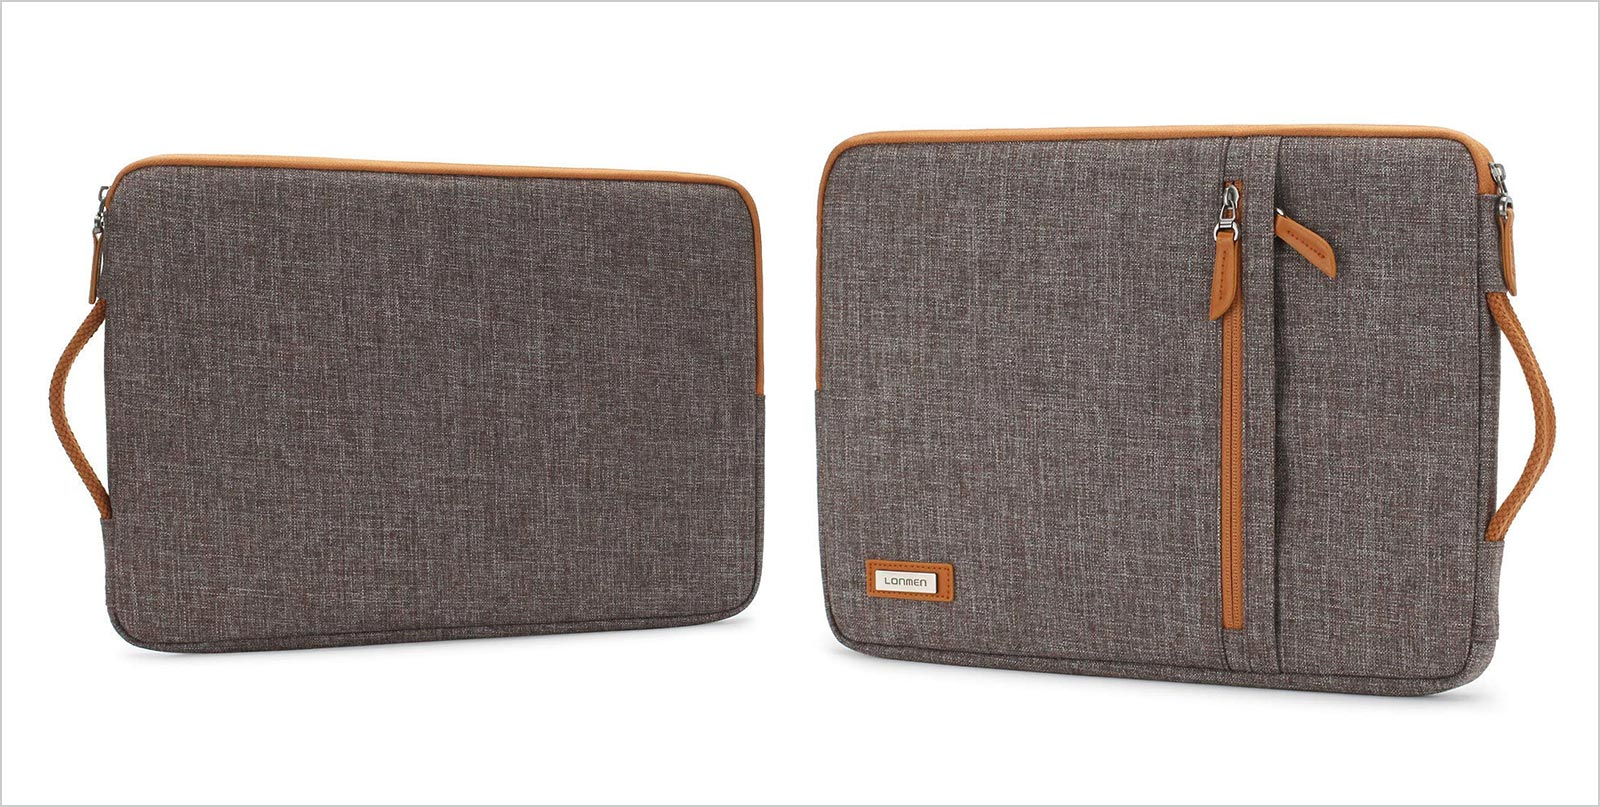 Laptop-Sleeve-Waterproof-Protective-Handbag-for-12-9-inches-iPad-Pro